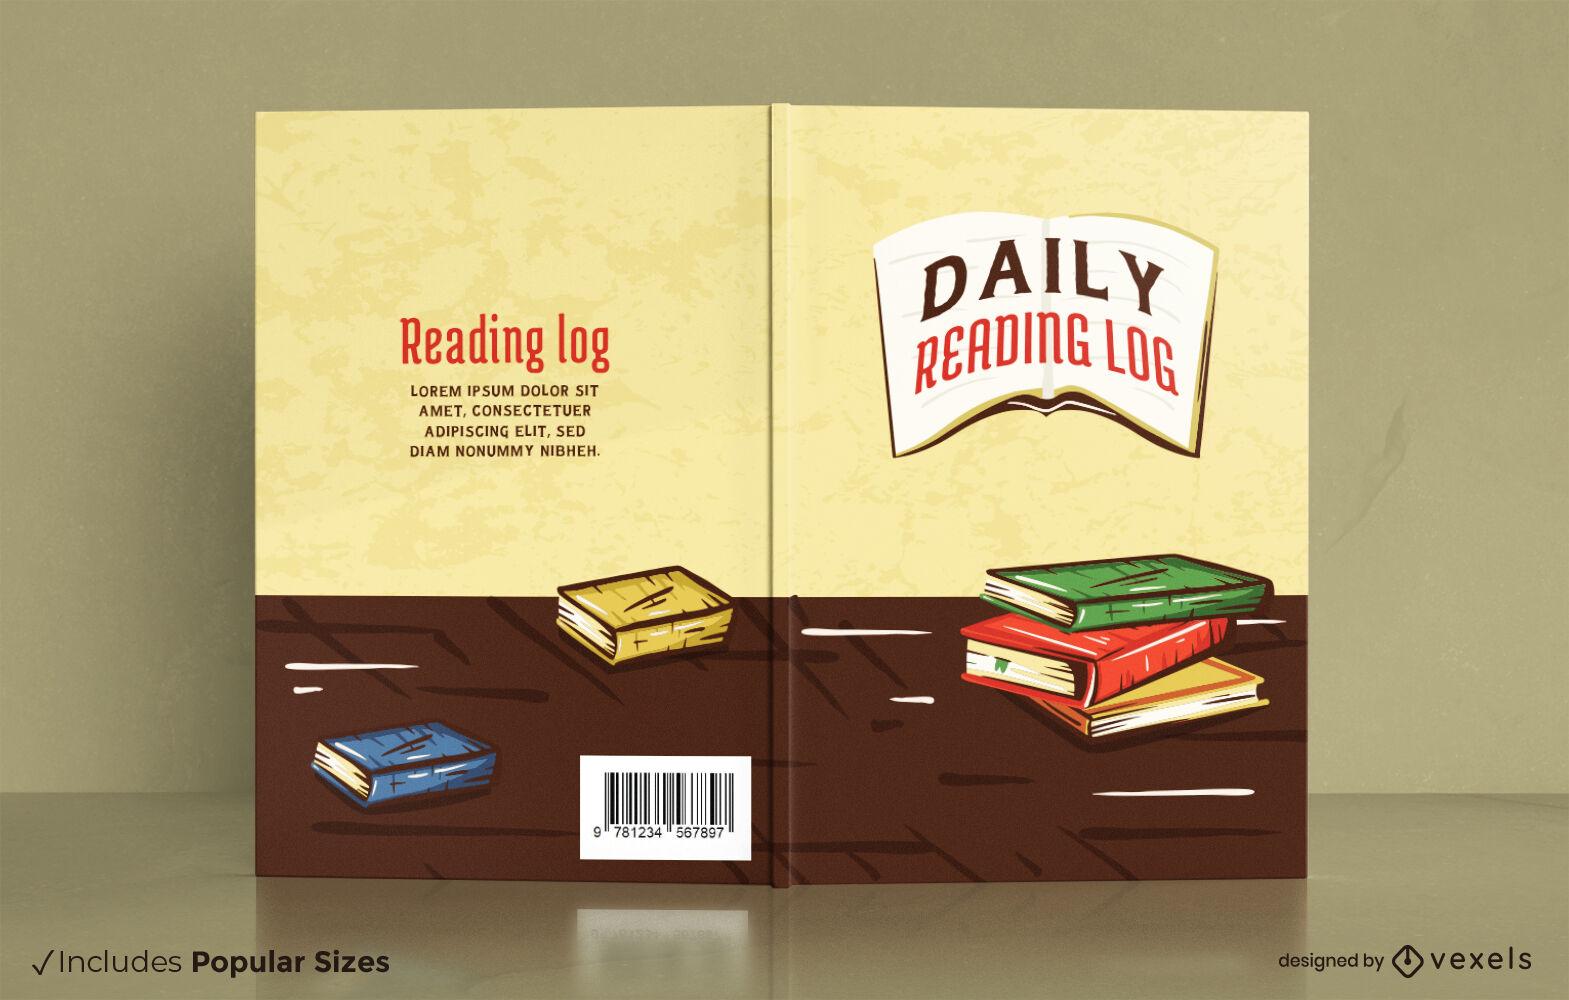 Reading log hand drawn book cover design